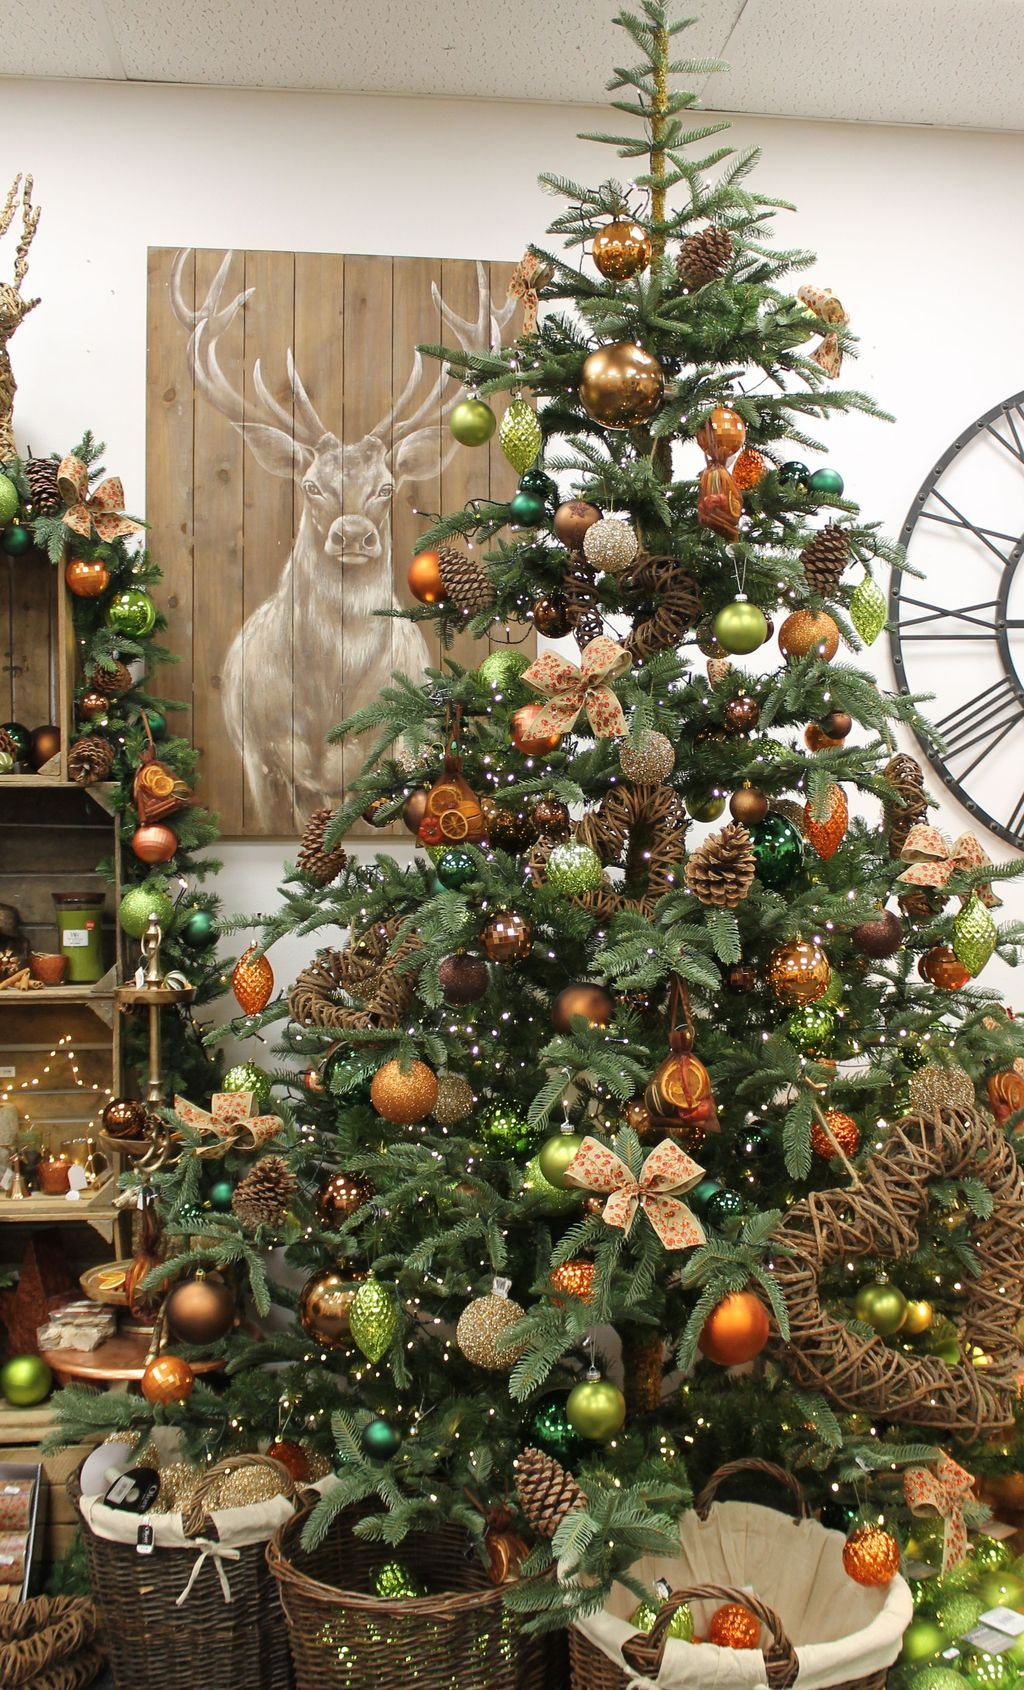 Amazing Winter Christmas Tree Design And Decor Ideas 14